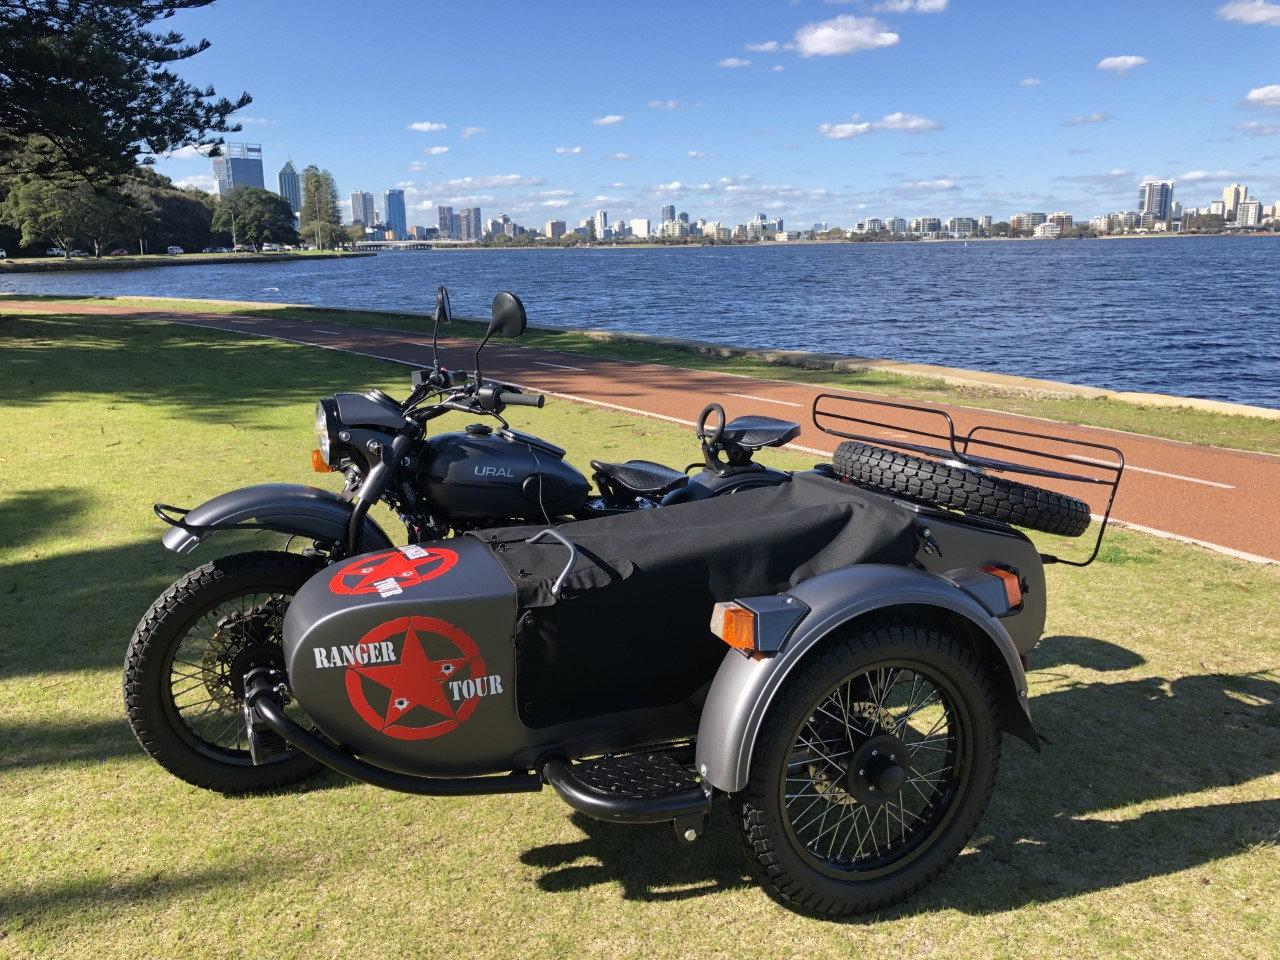 BOOK 'BORIS' the Motorcycle Sidecar